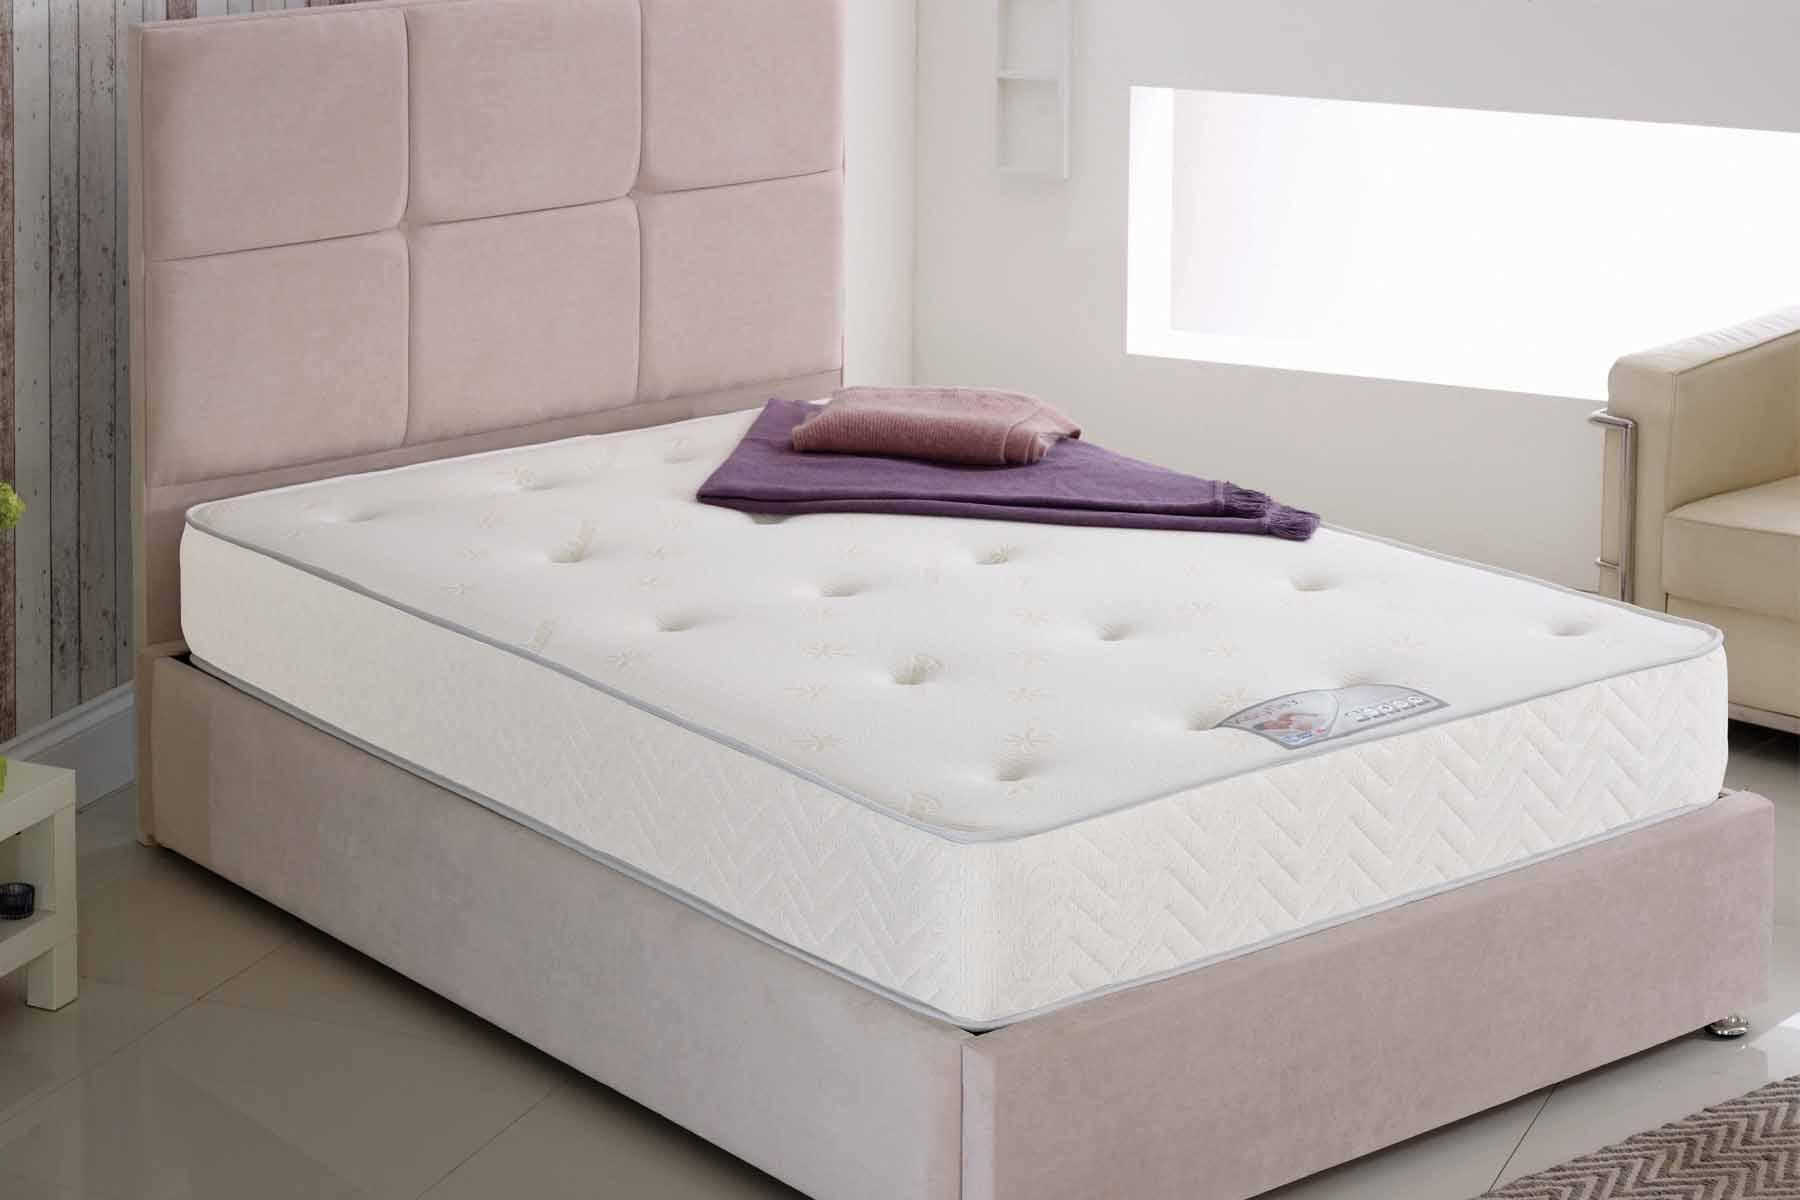 buy kayflex windsor open ottoman divan bed online cfs uk. Black Bedroom Furniture Sets. Home Design Ideas